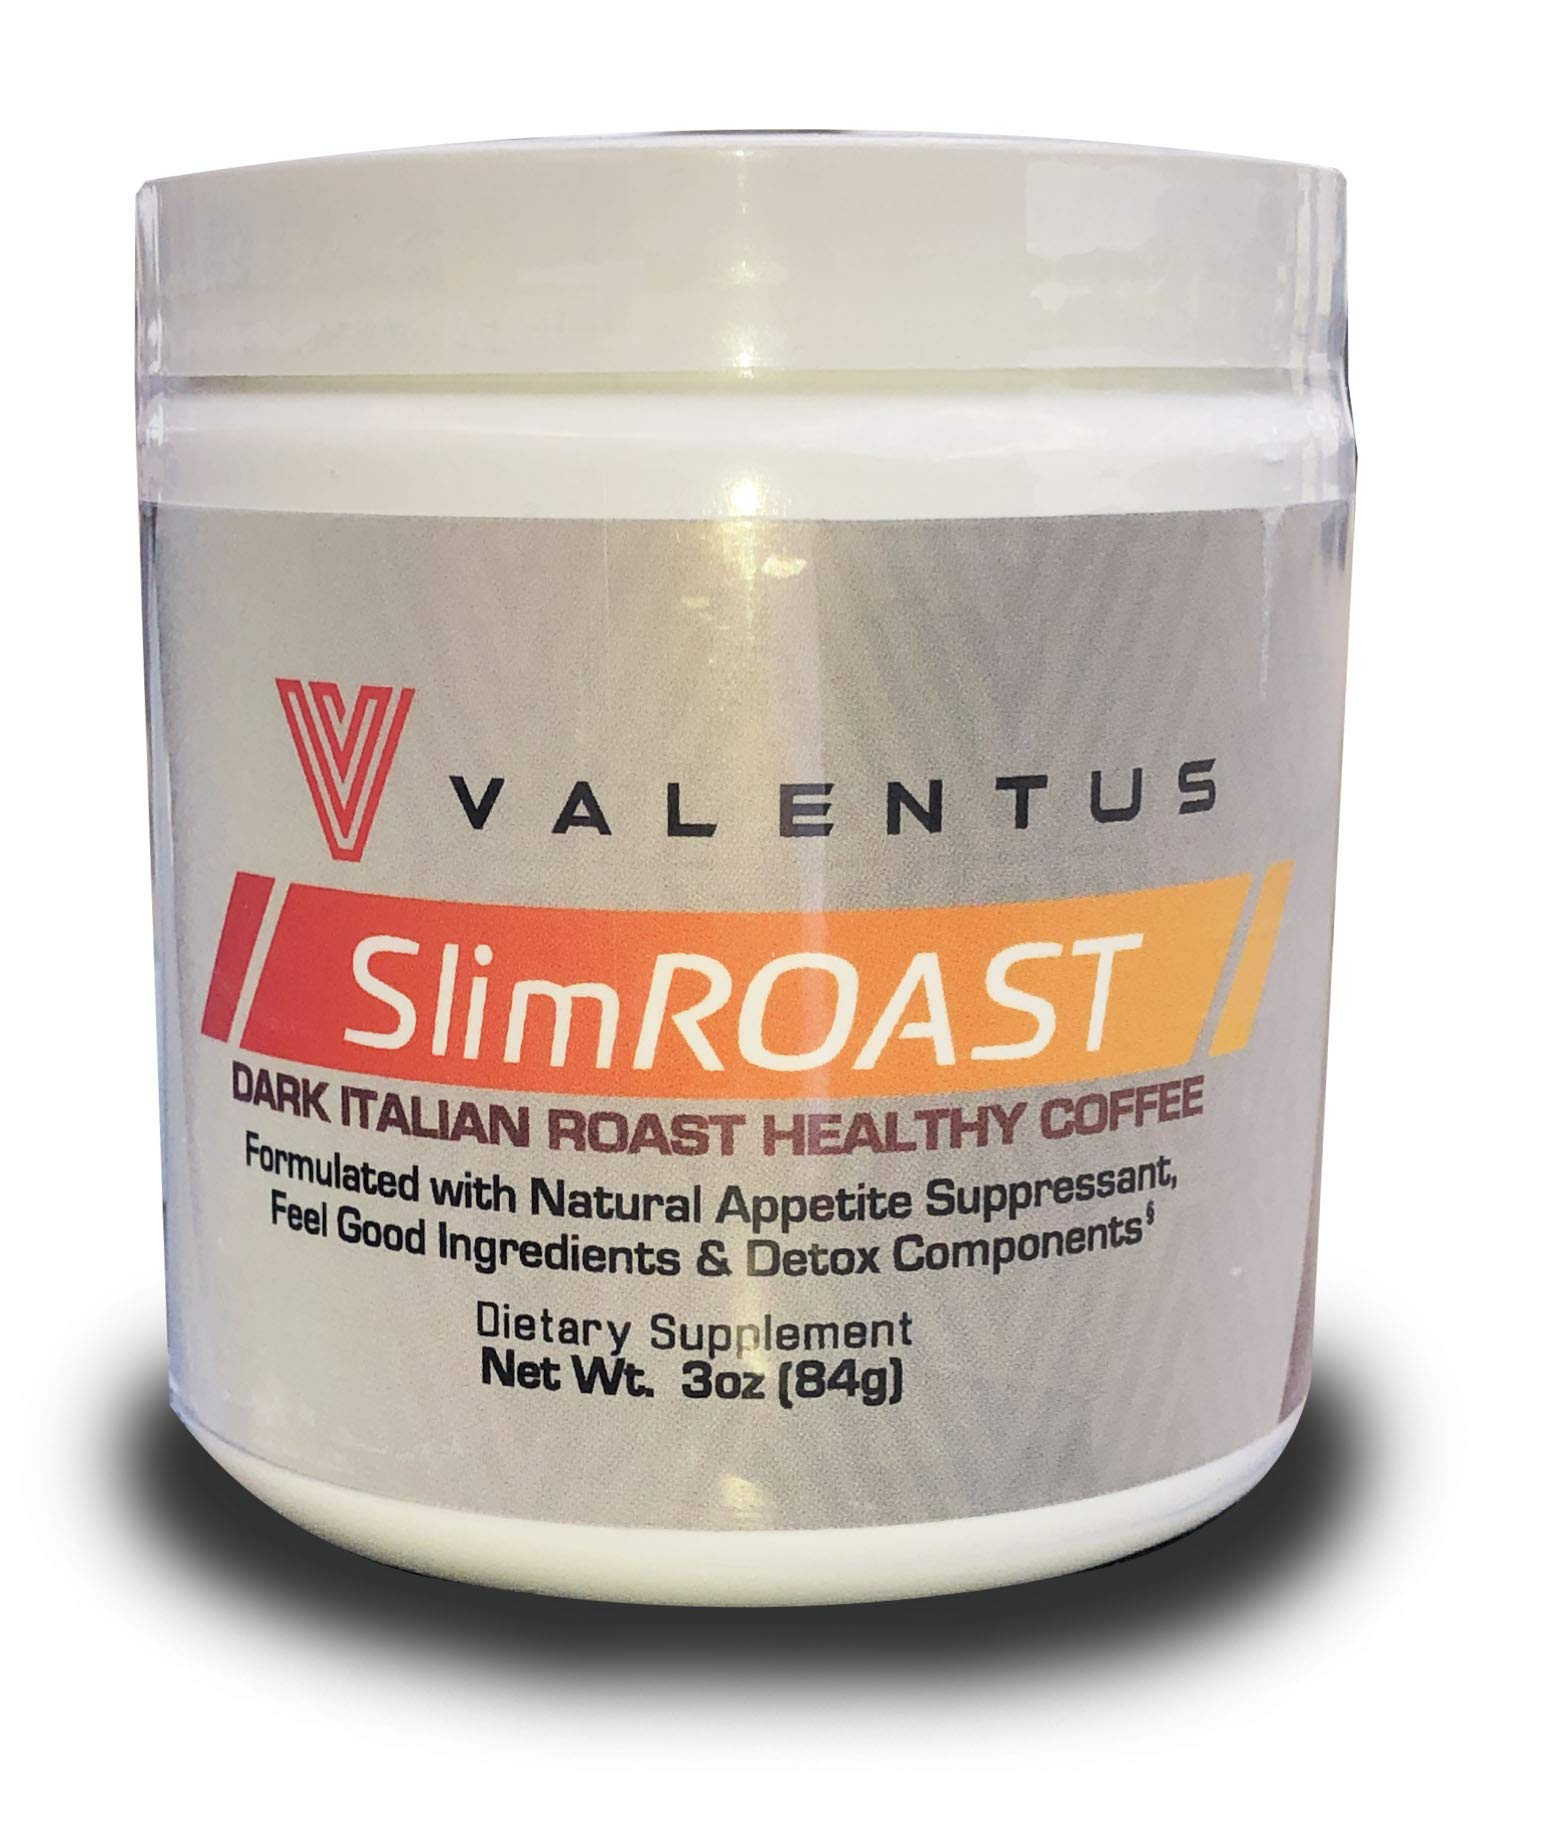 VALENTUS Slim Roast - Italian Dark Roast Coffee 3 Oz. Canister (24 Servings) by VALENTUS